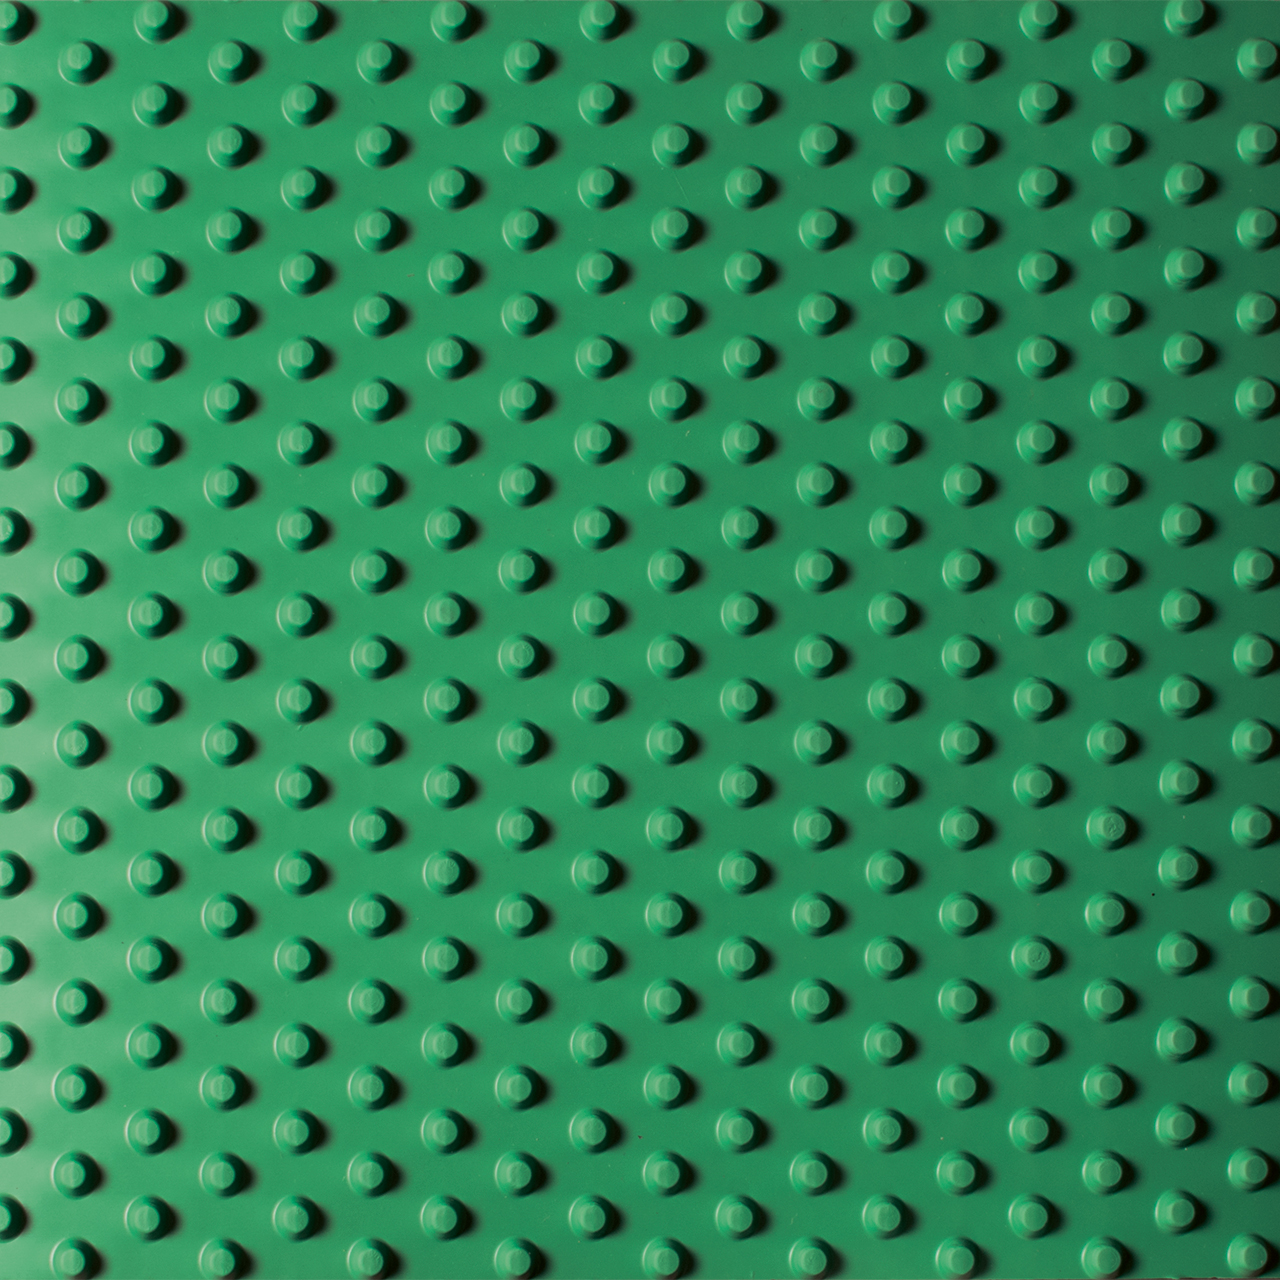 Slip-Resistant Matting | Pebble Green